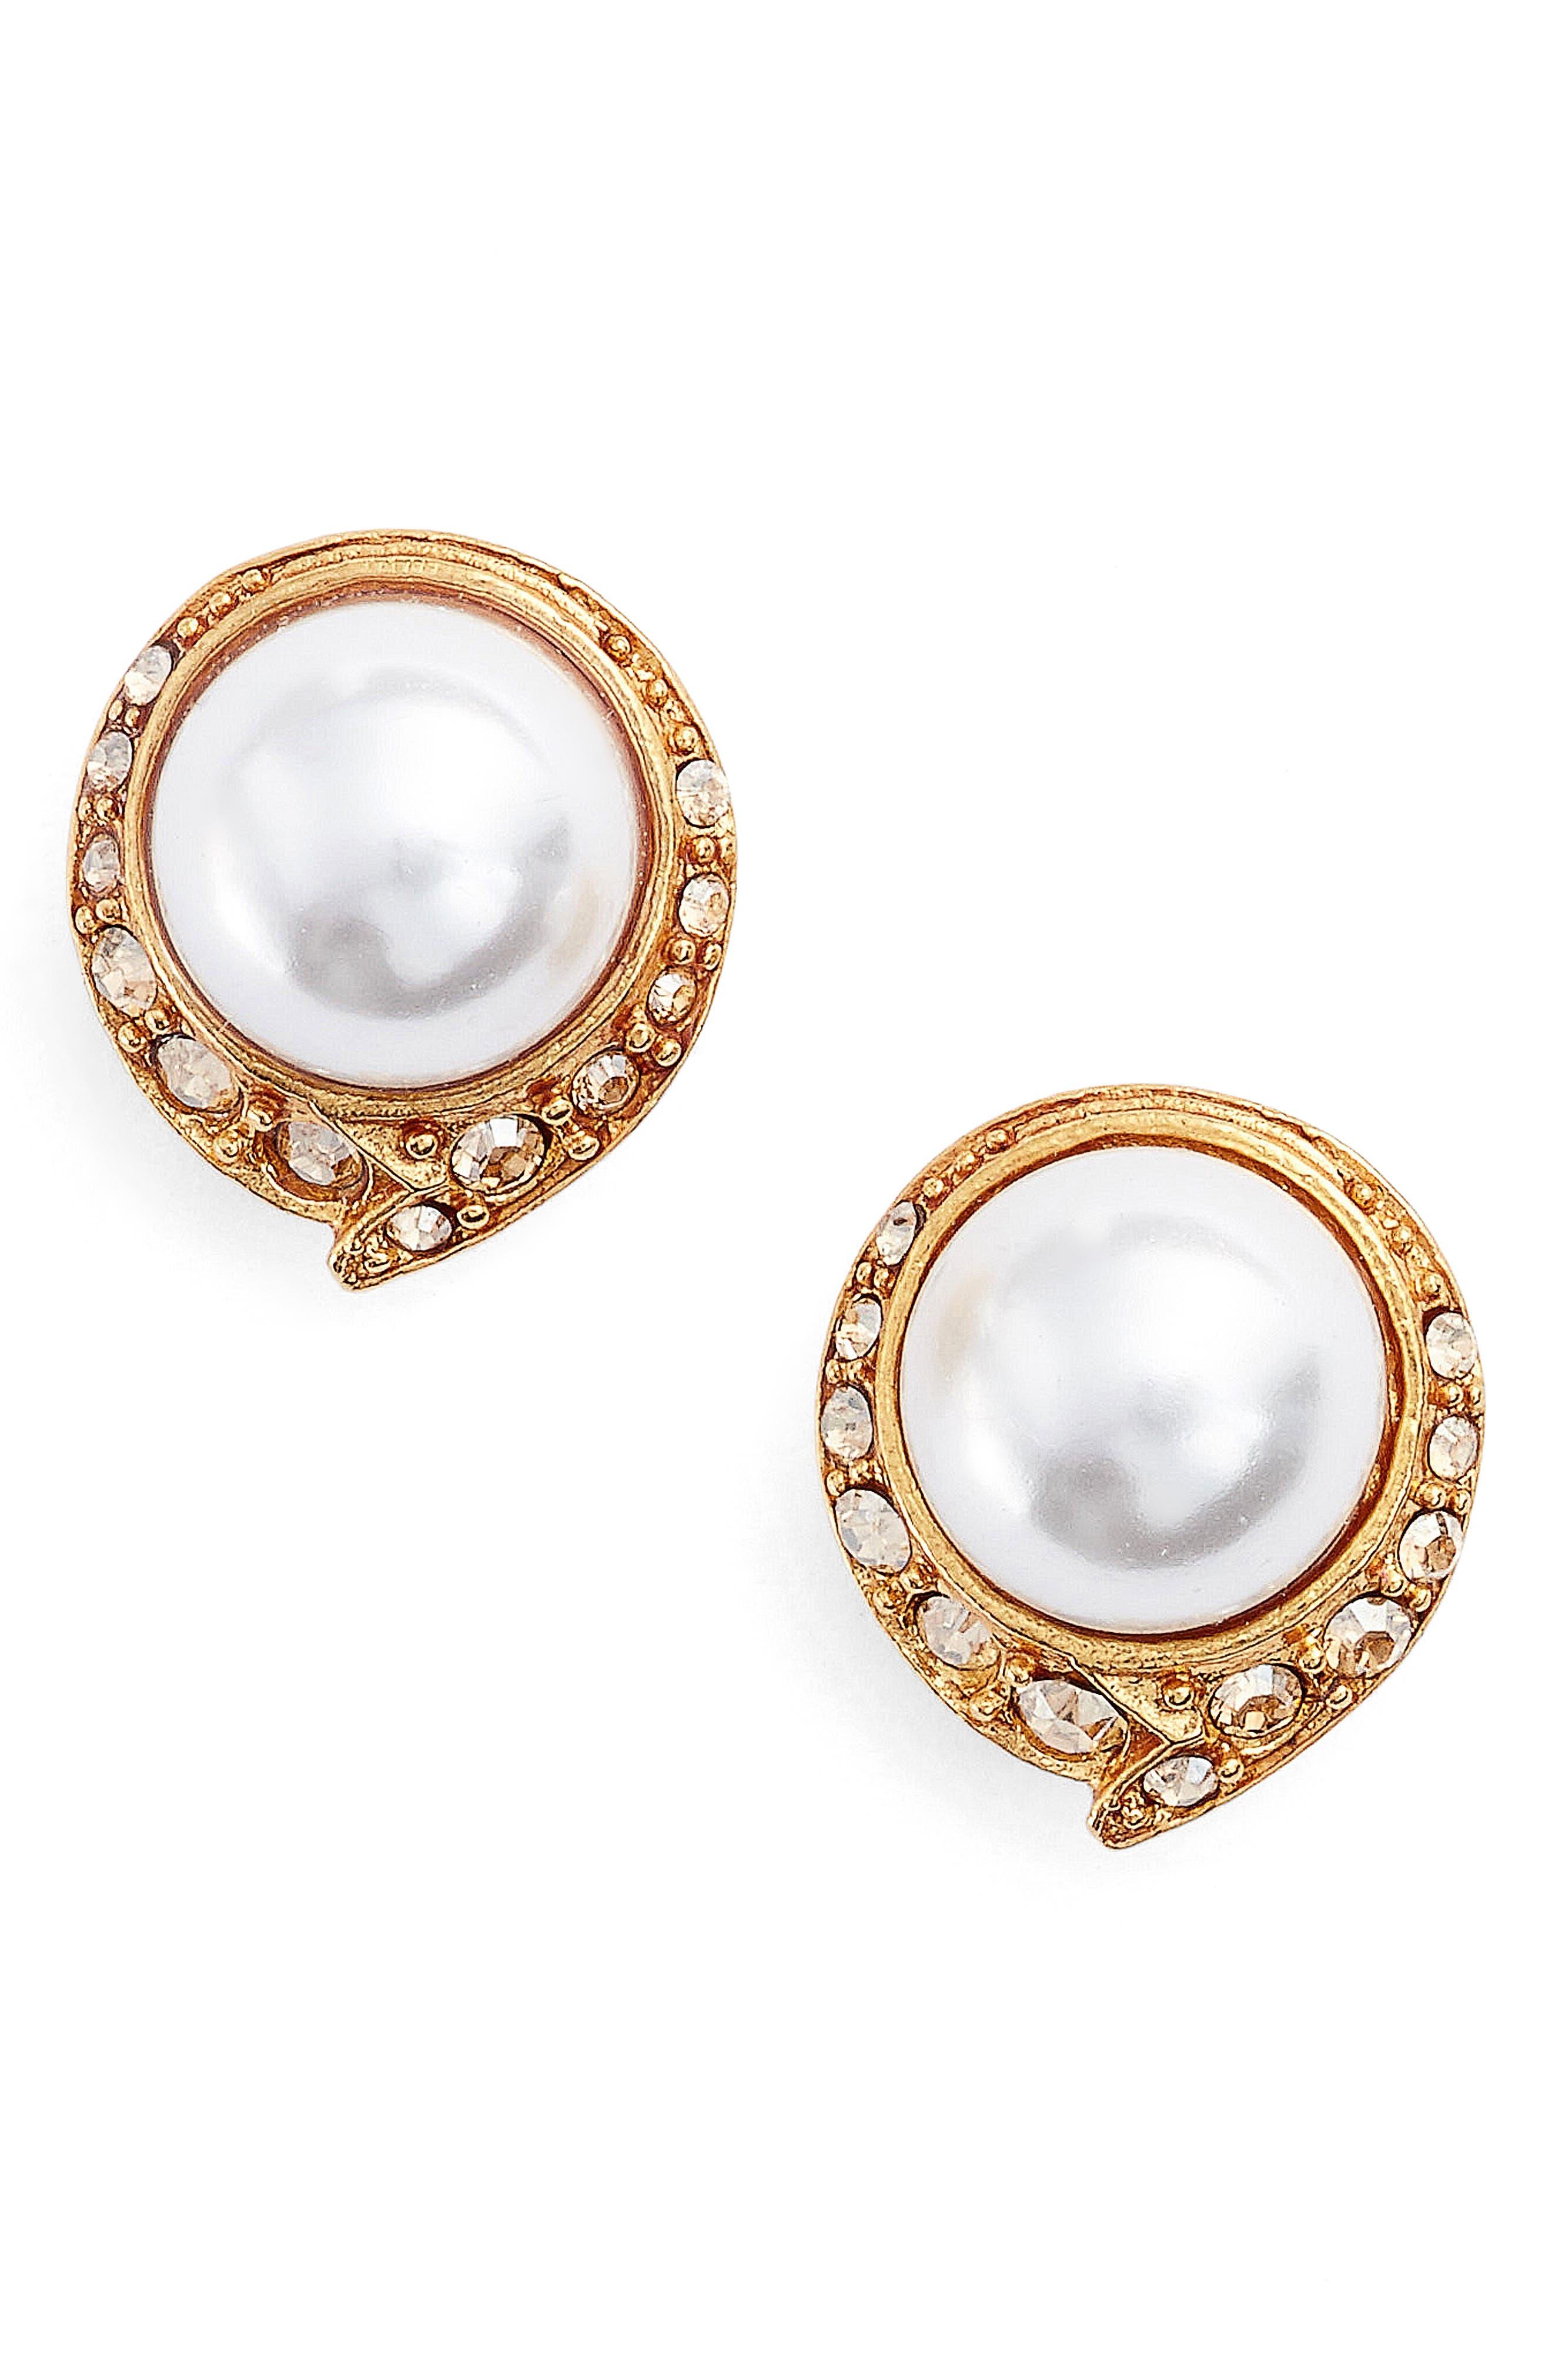 Alternate Image 1 Selected - Oscar de la Renta Simulated Pearl Stud Earrings